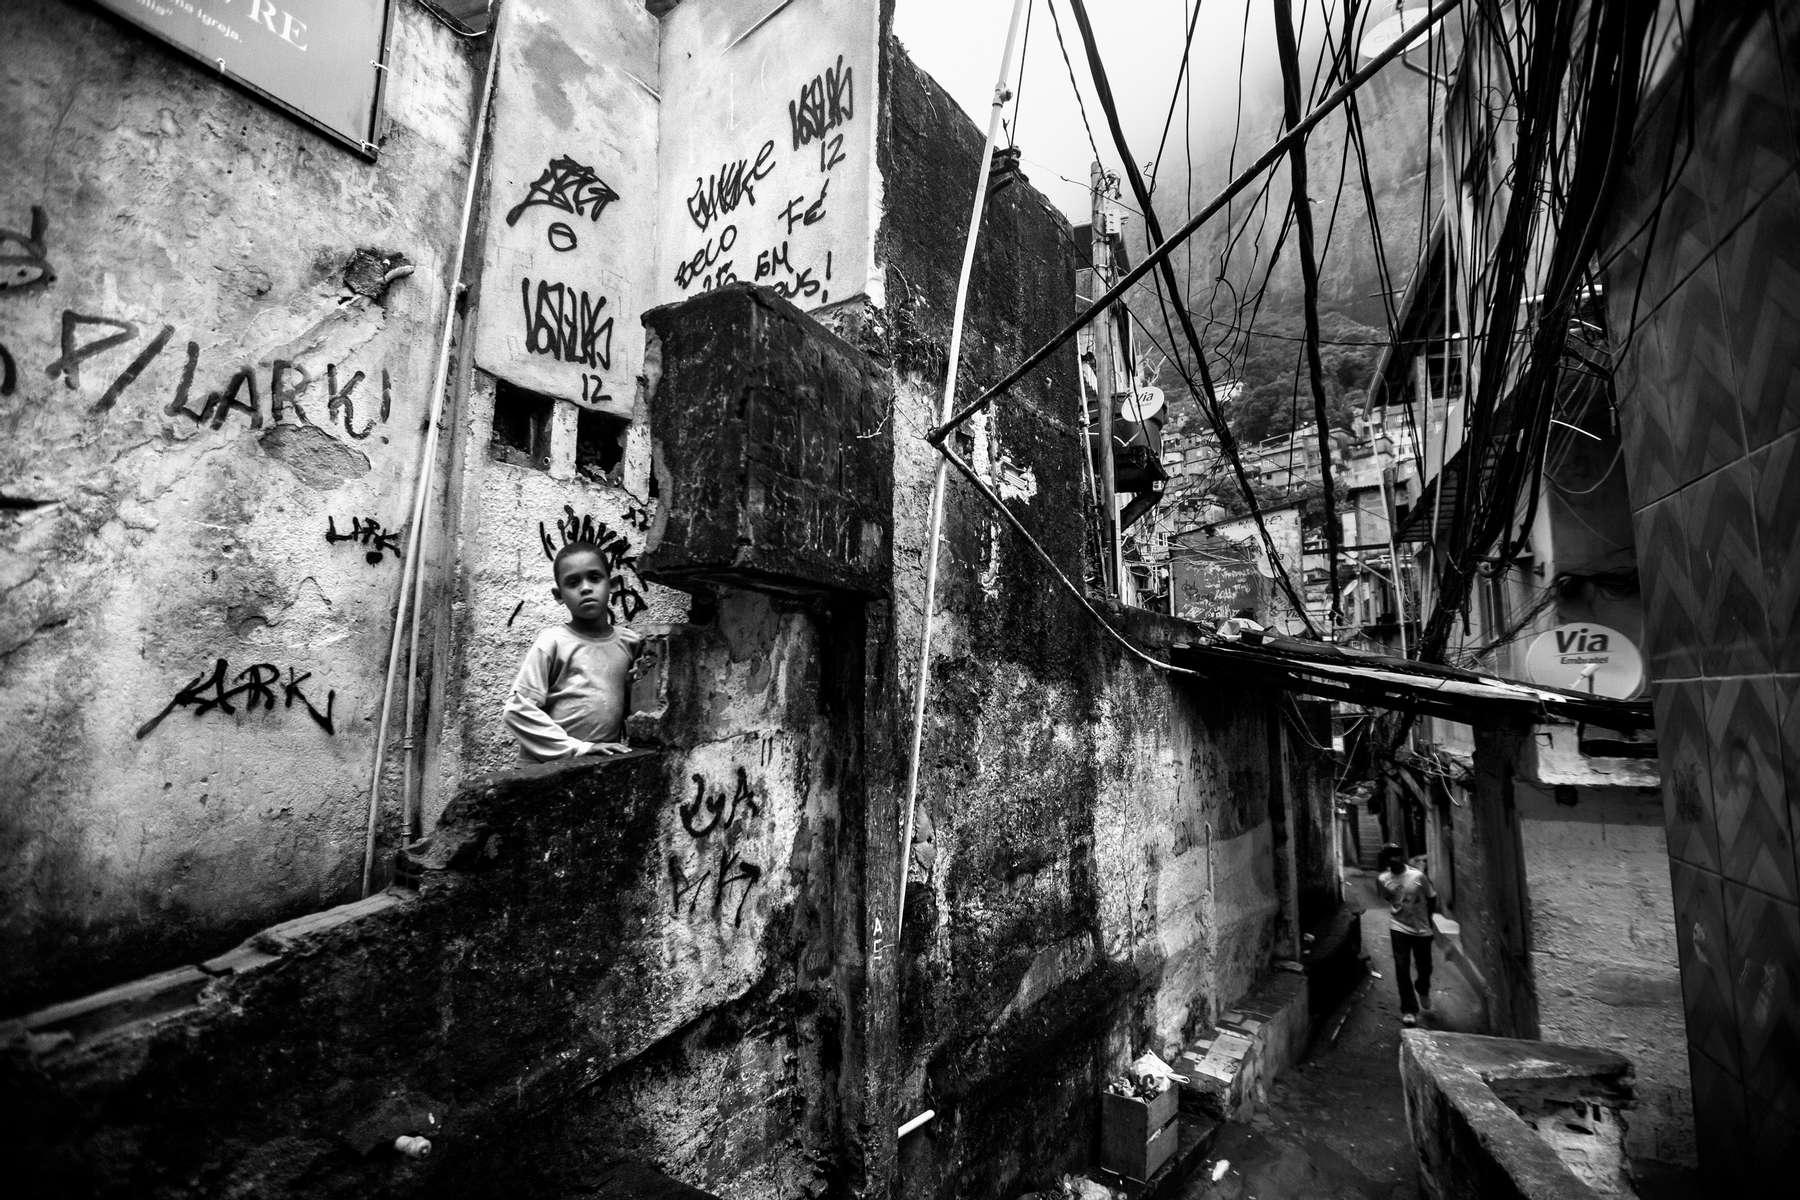 Un joven mira a la cámara en Rocinha, la favela  más grande de Río de Janeiro, Brasil, 26 de noviembre de 2012.